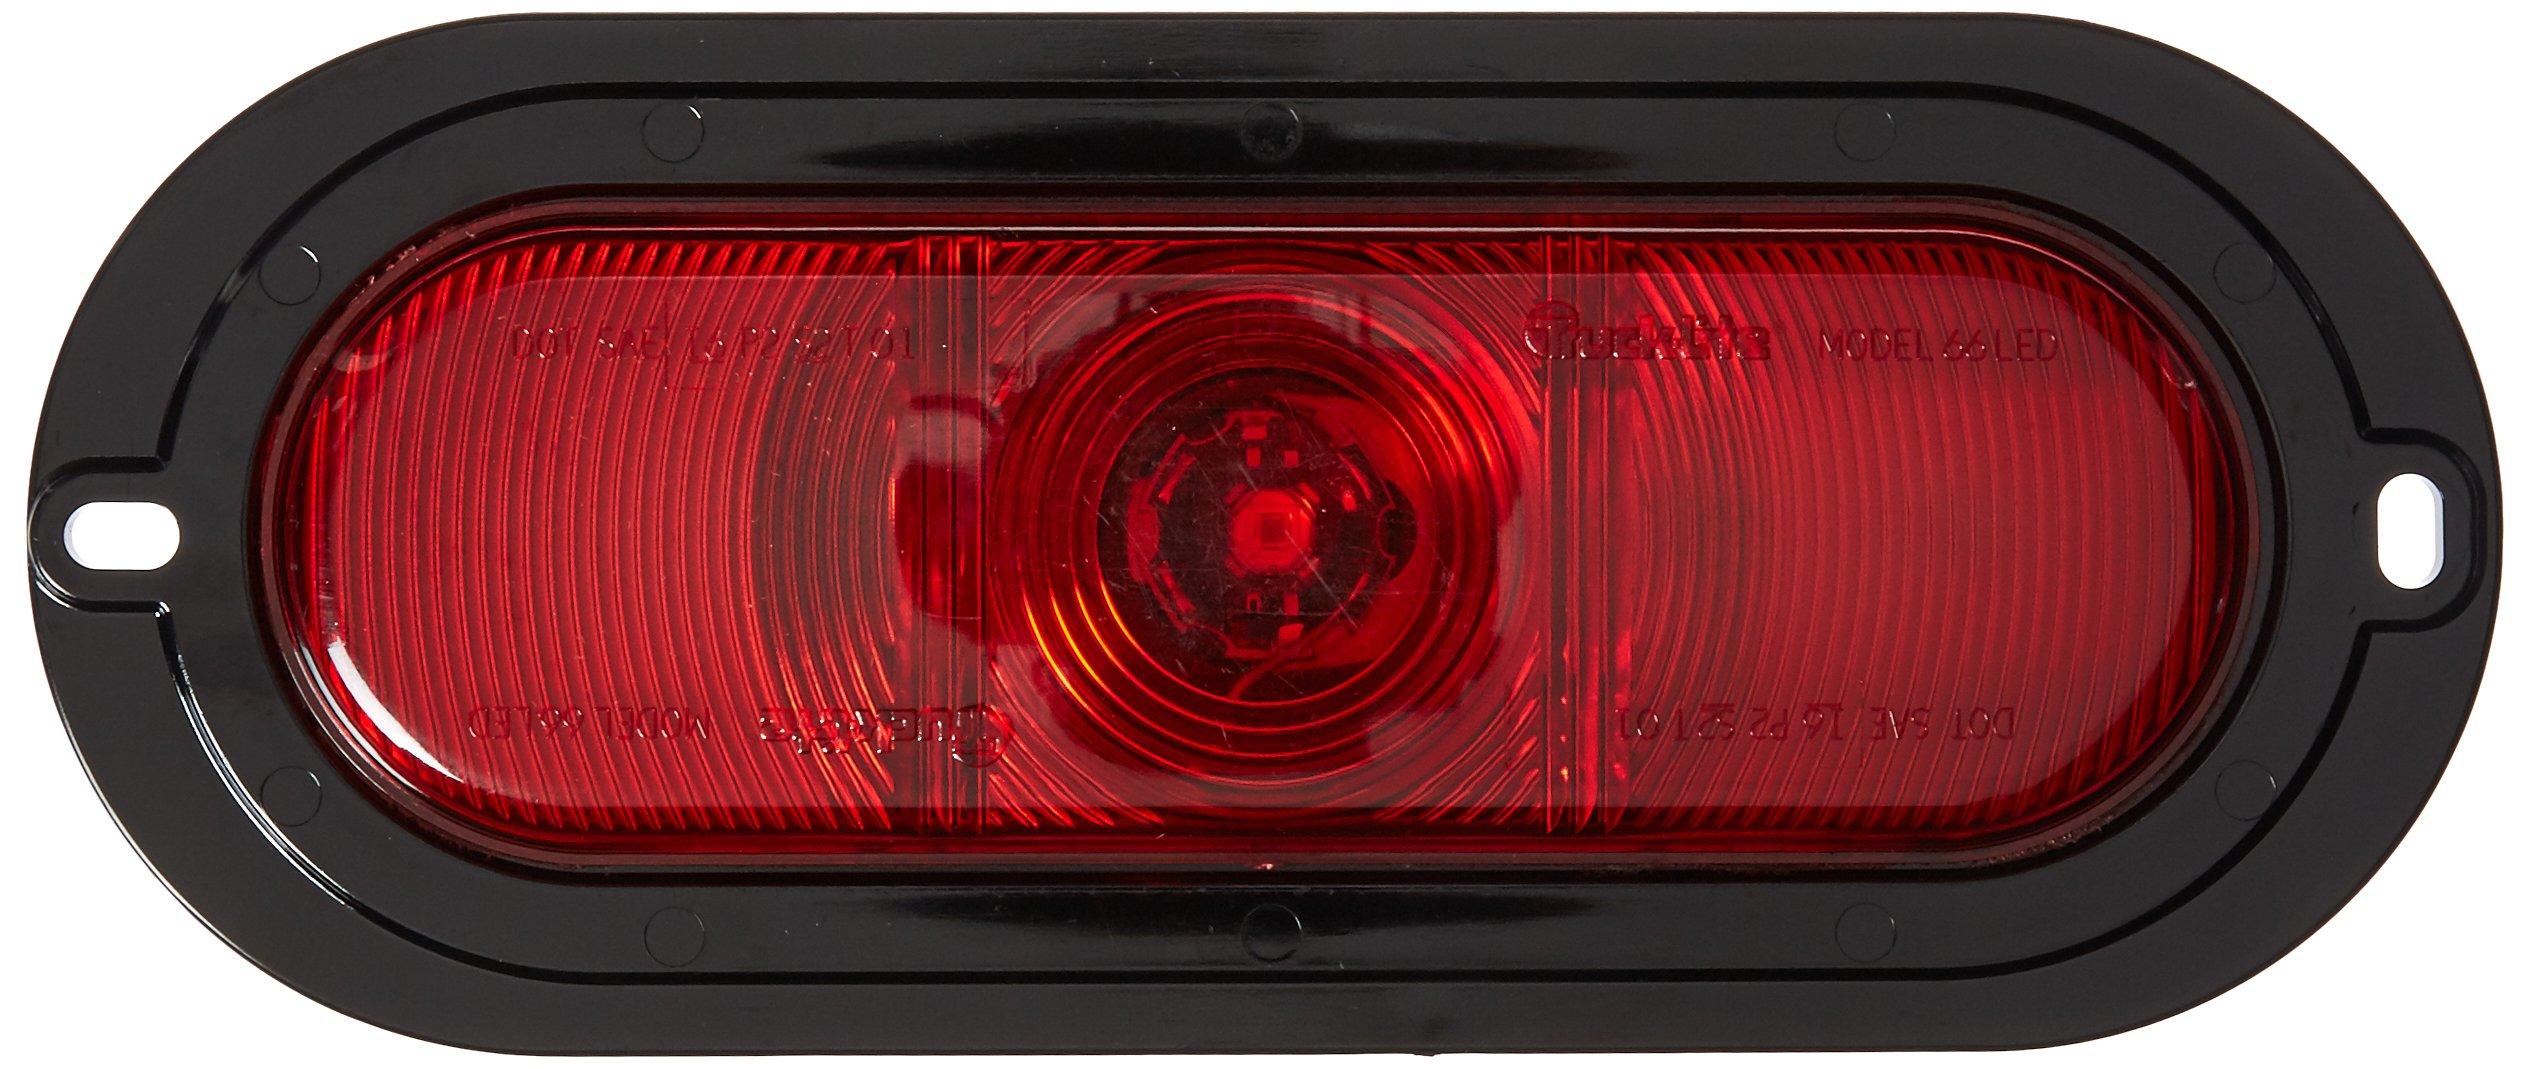 Truck-Lite (66256R) Stop/Turn/Tail LED Light Kit by Truck-Lite